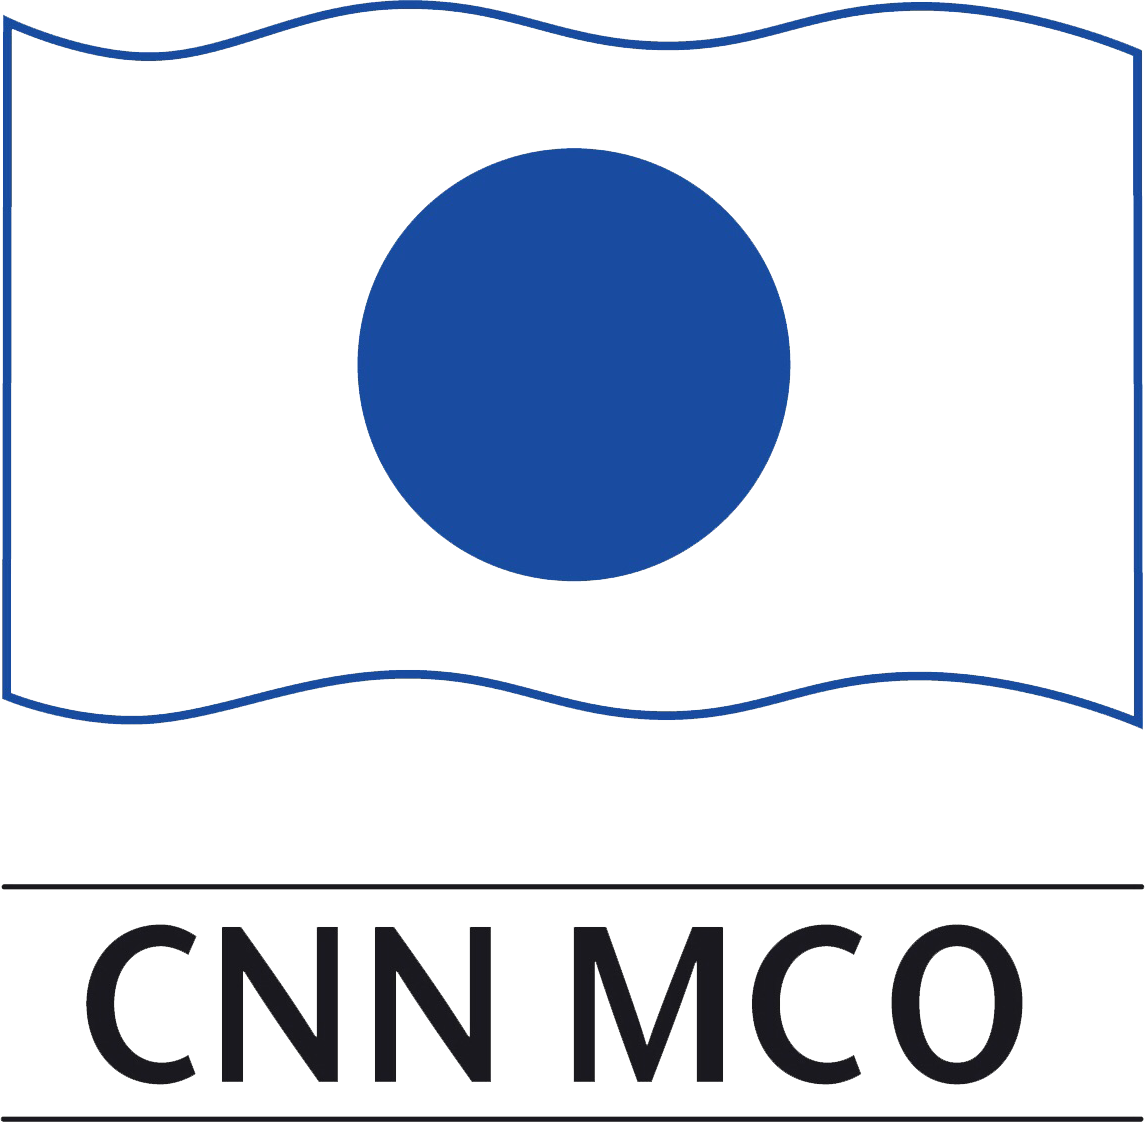 //www.chessmaritime.com/wp-content/uploads/2020/03/cnn-mco-logo.png